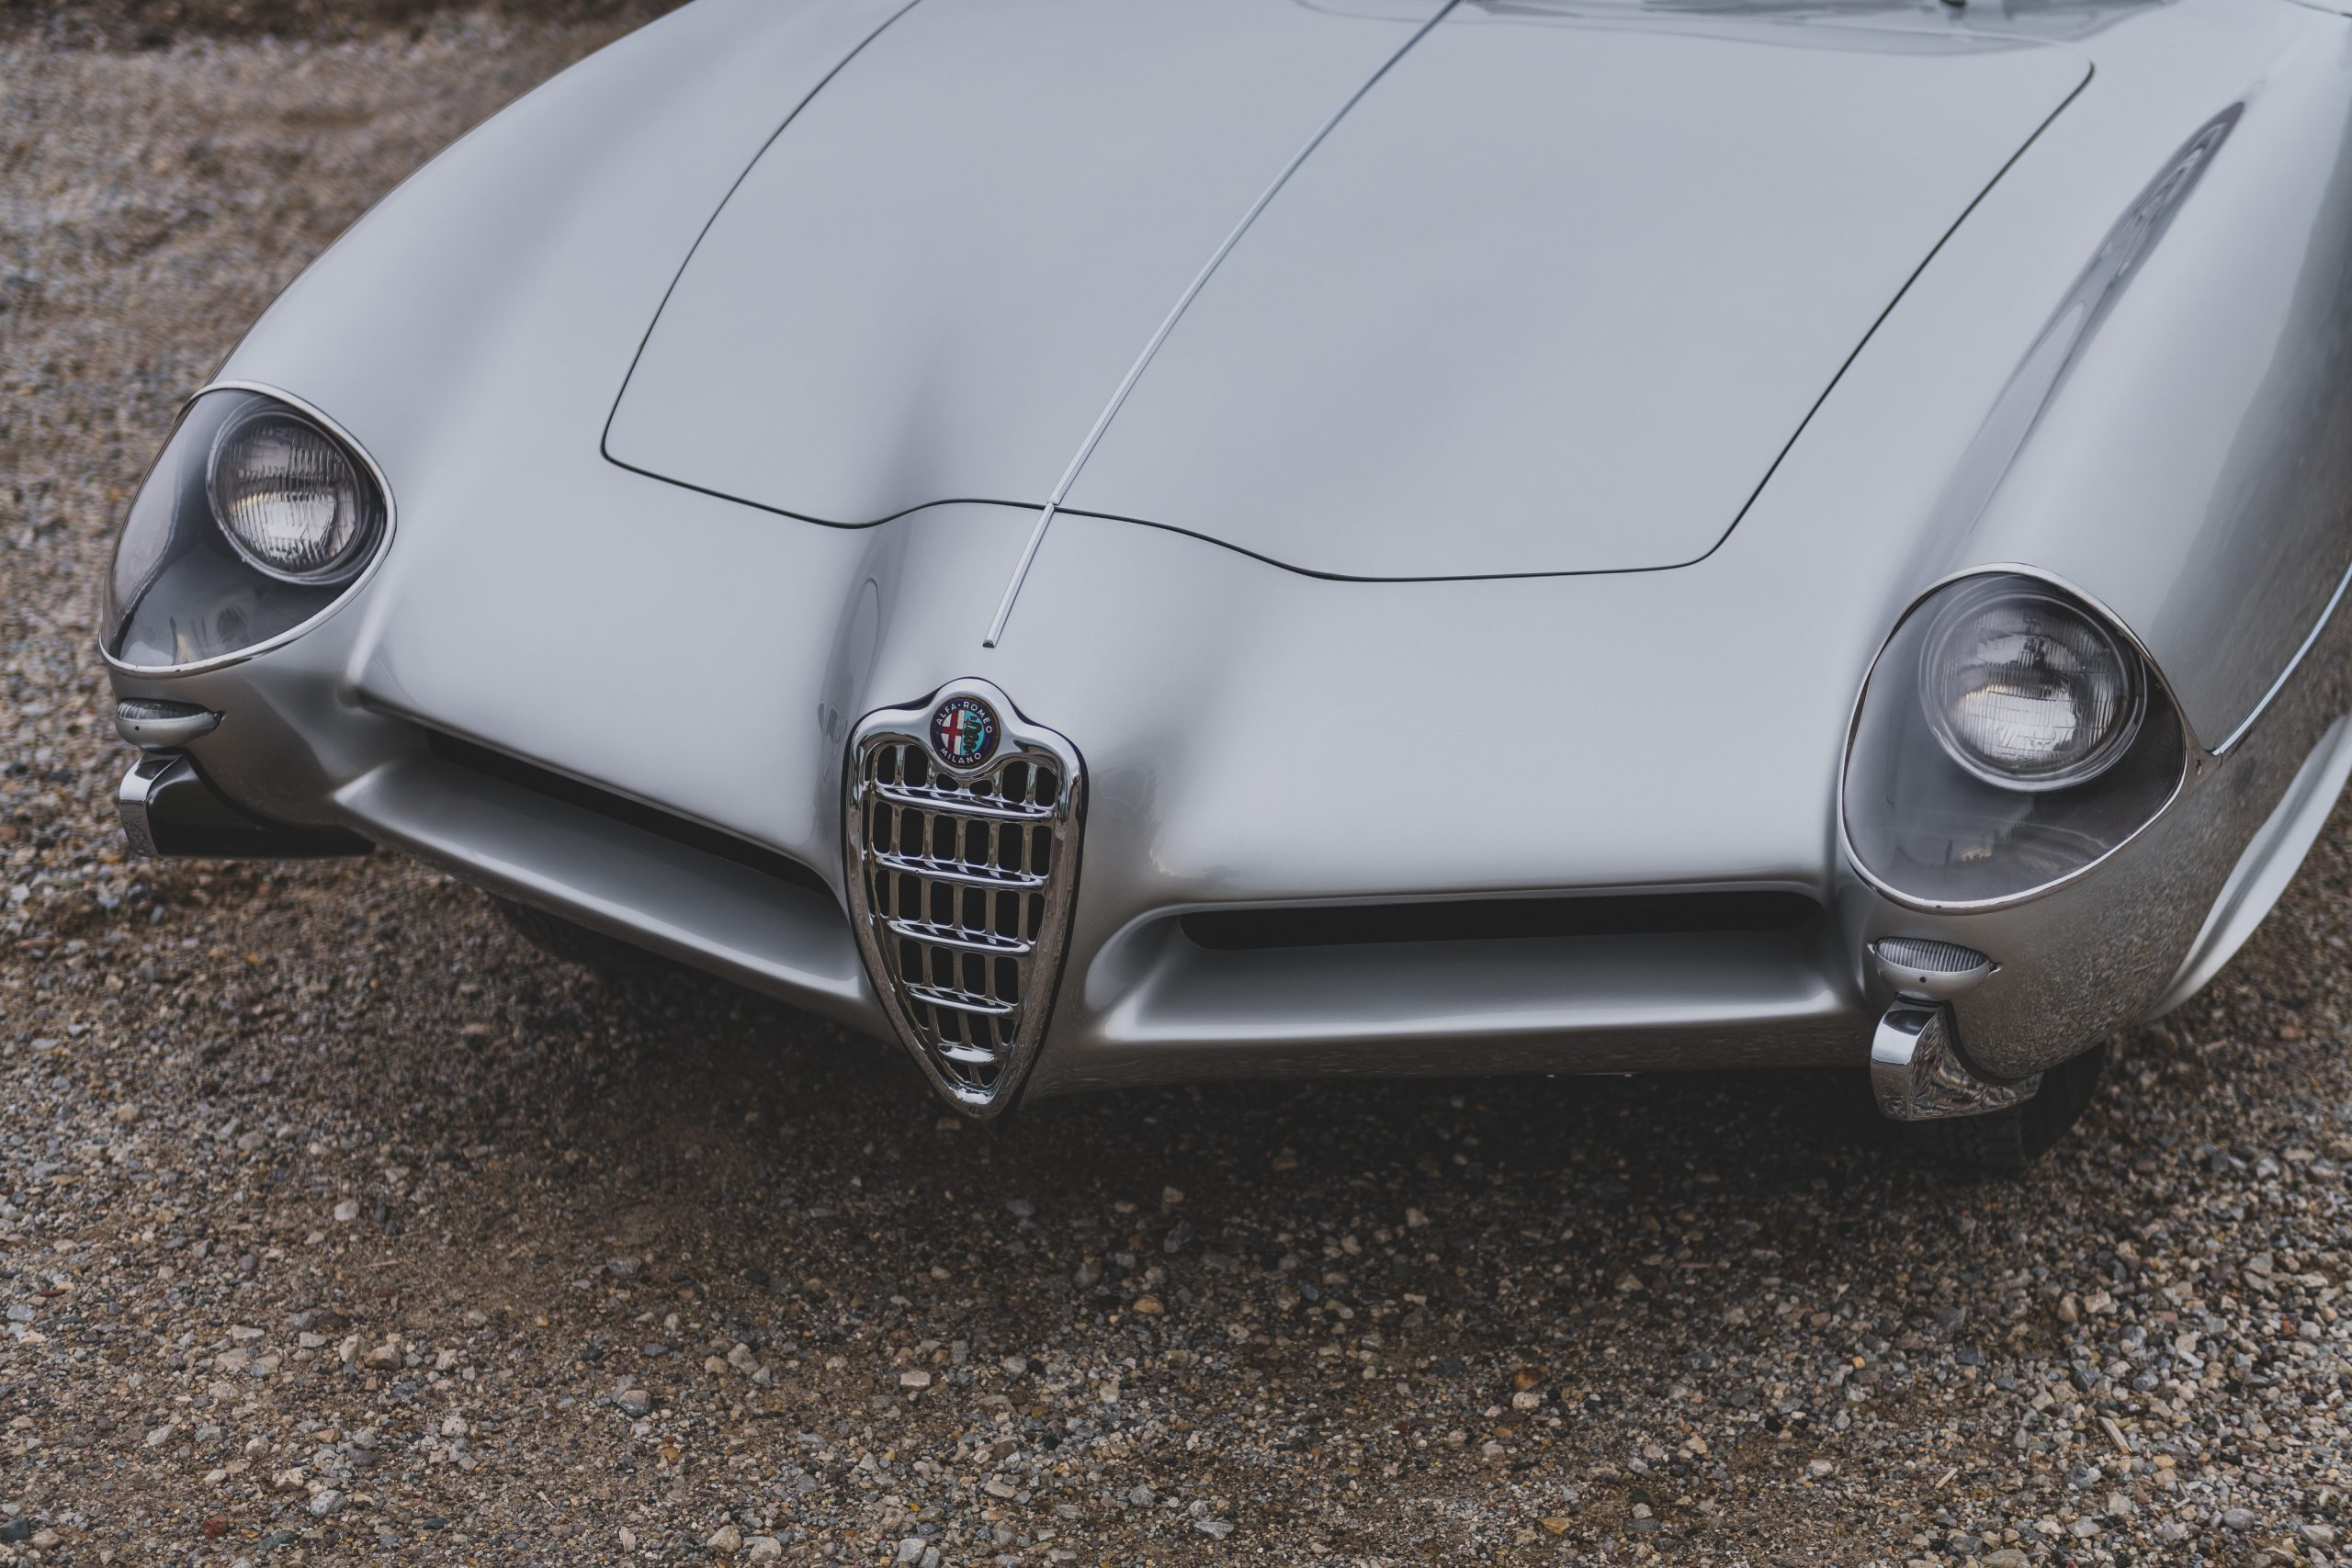 Alfa Romeo Berlina Aerodinamica Tecnica front